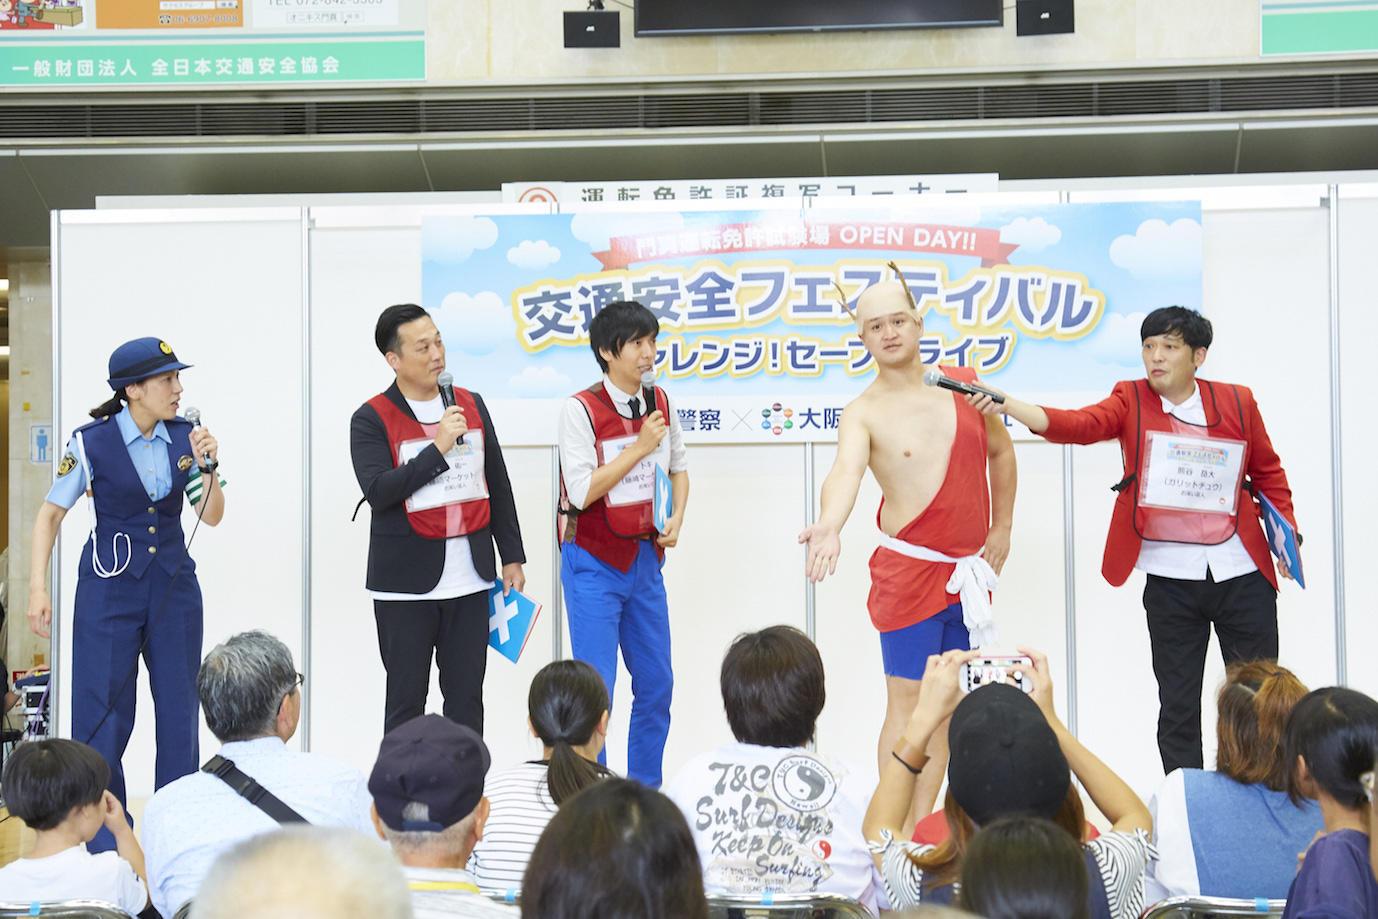 http://news.yoshimoto.co.jp/20181012090315-bfb3322fd35116bca57c582a0937169afa13c72c.jpg